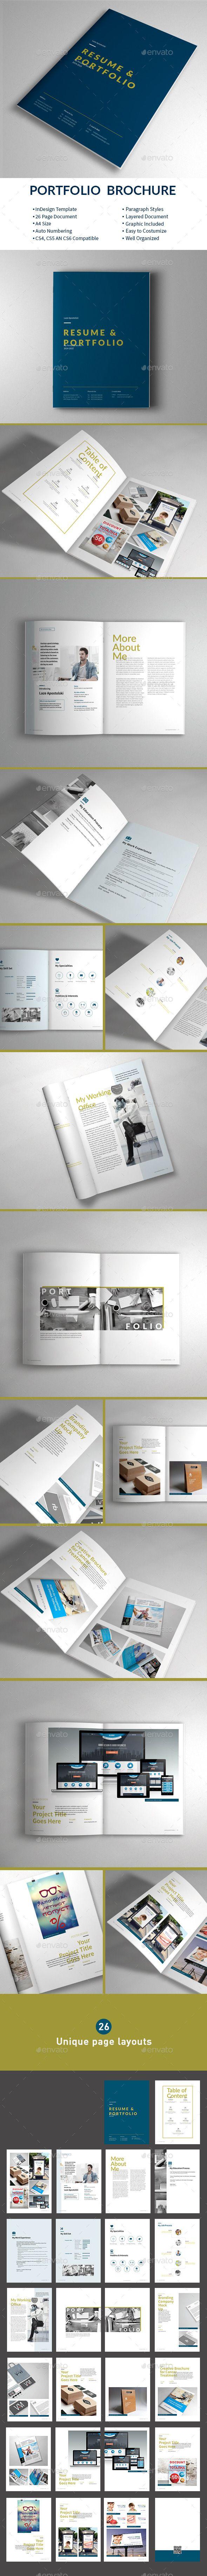 Portfolio Brochure Template InDesign INDD #design Download: http://graphicriver.net/item/portfolio-brochure-template/13715957?ref=ksioks